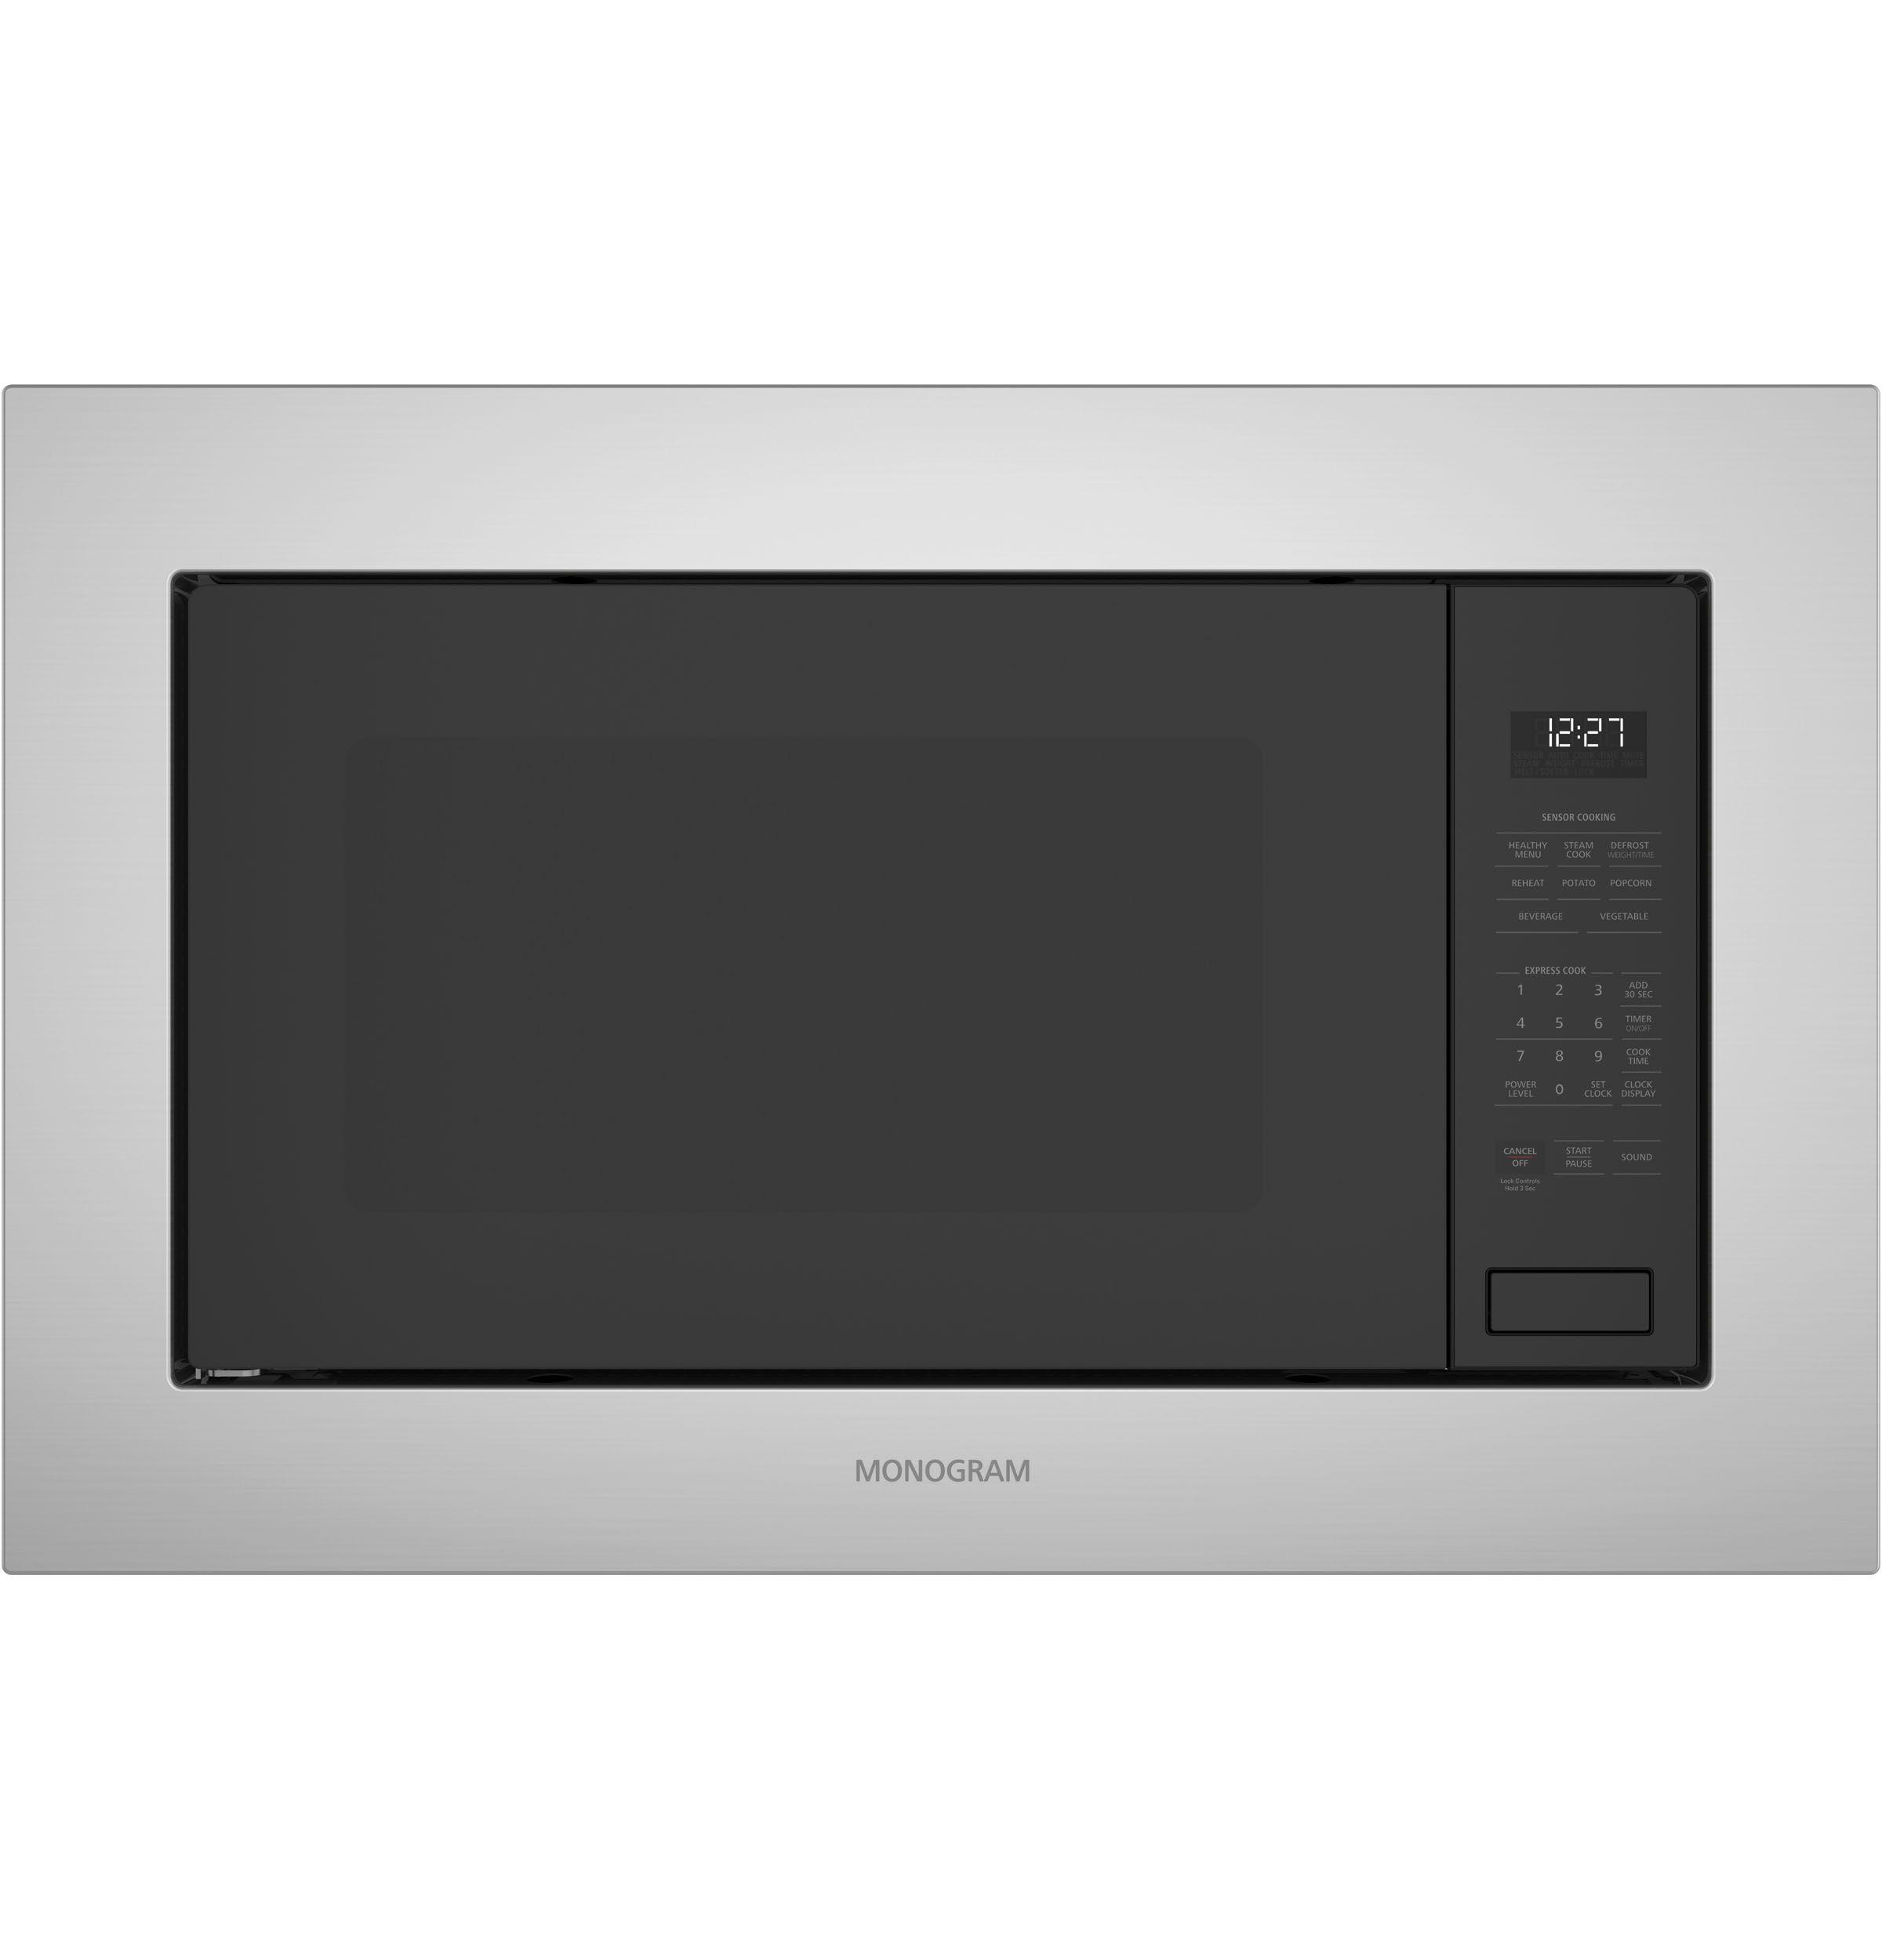 Monogram 2 2 Cu Ft Built In Microwave Oven Model Zeb1227slss